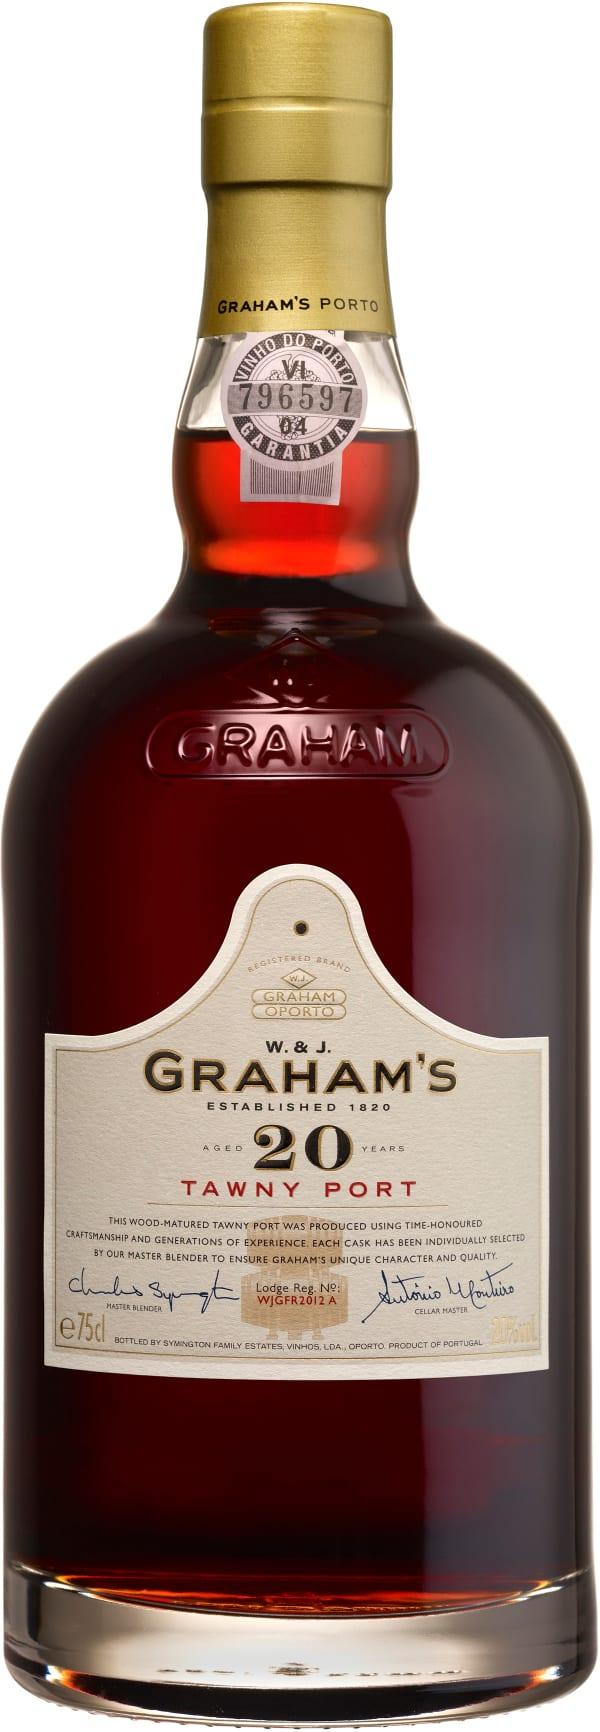 Graham's Aged 20 Years Tawny Port